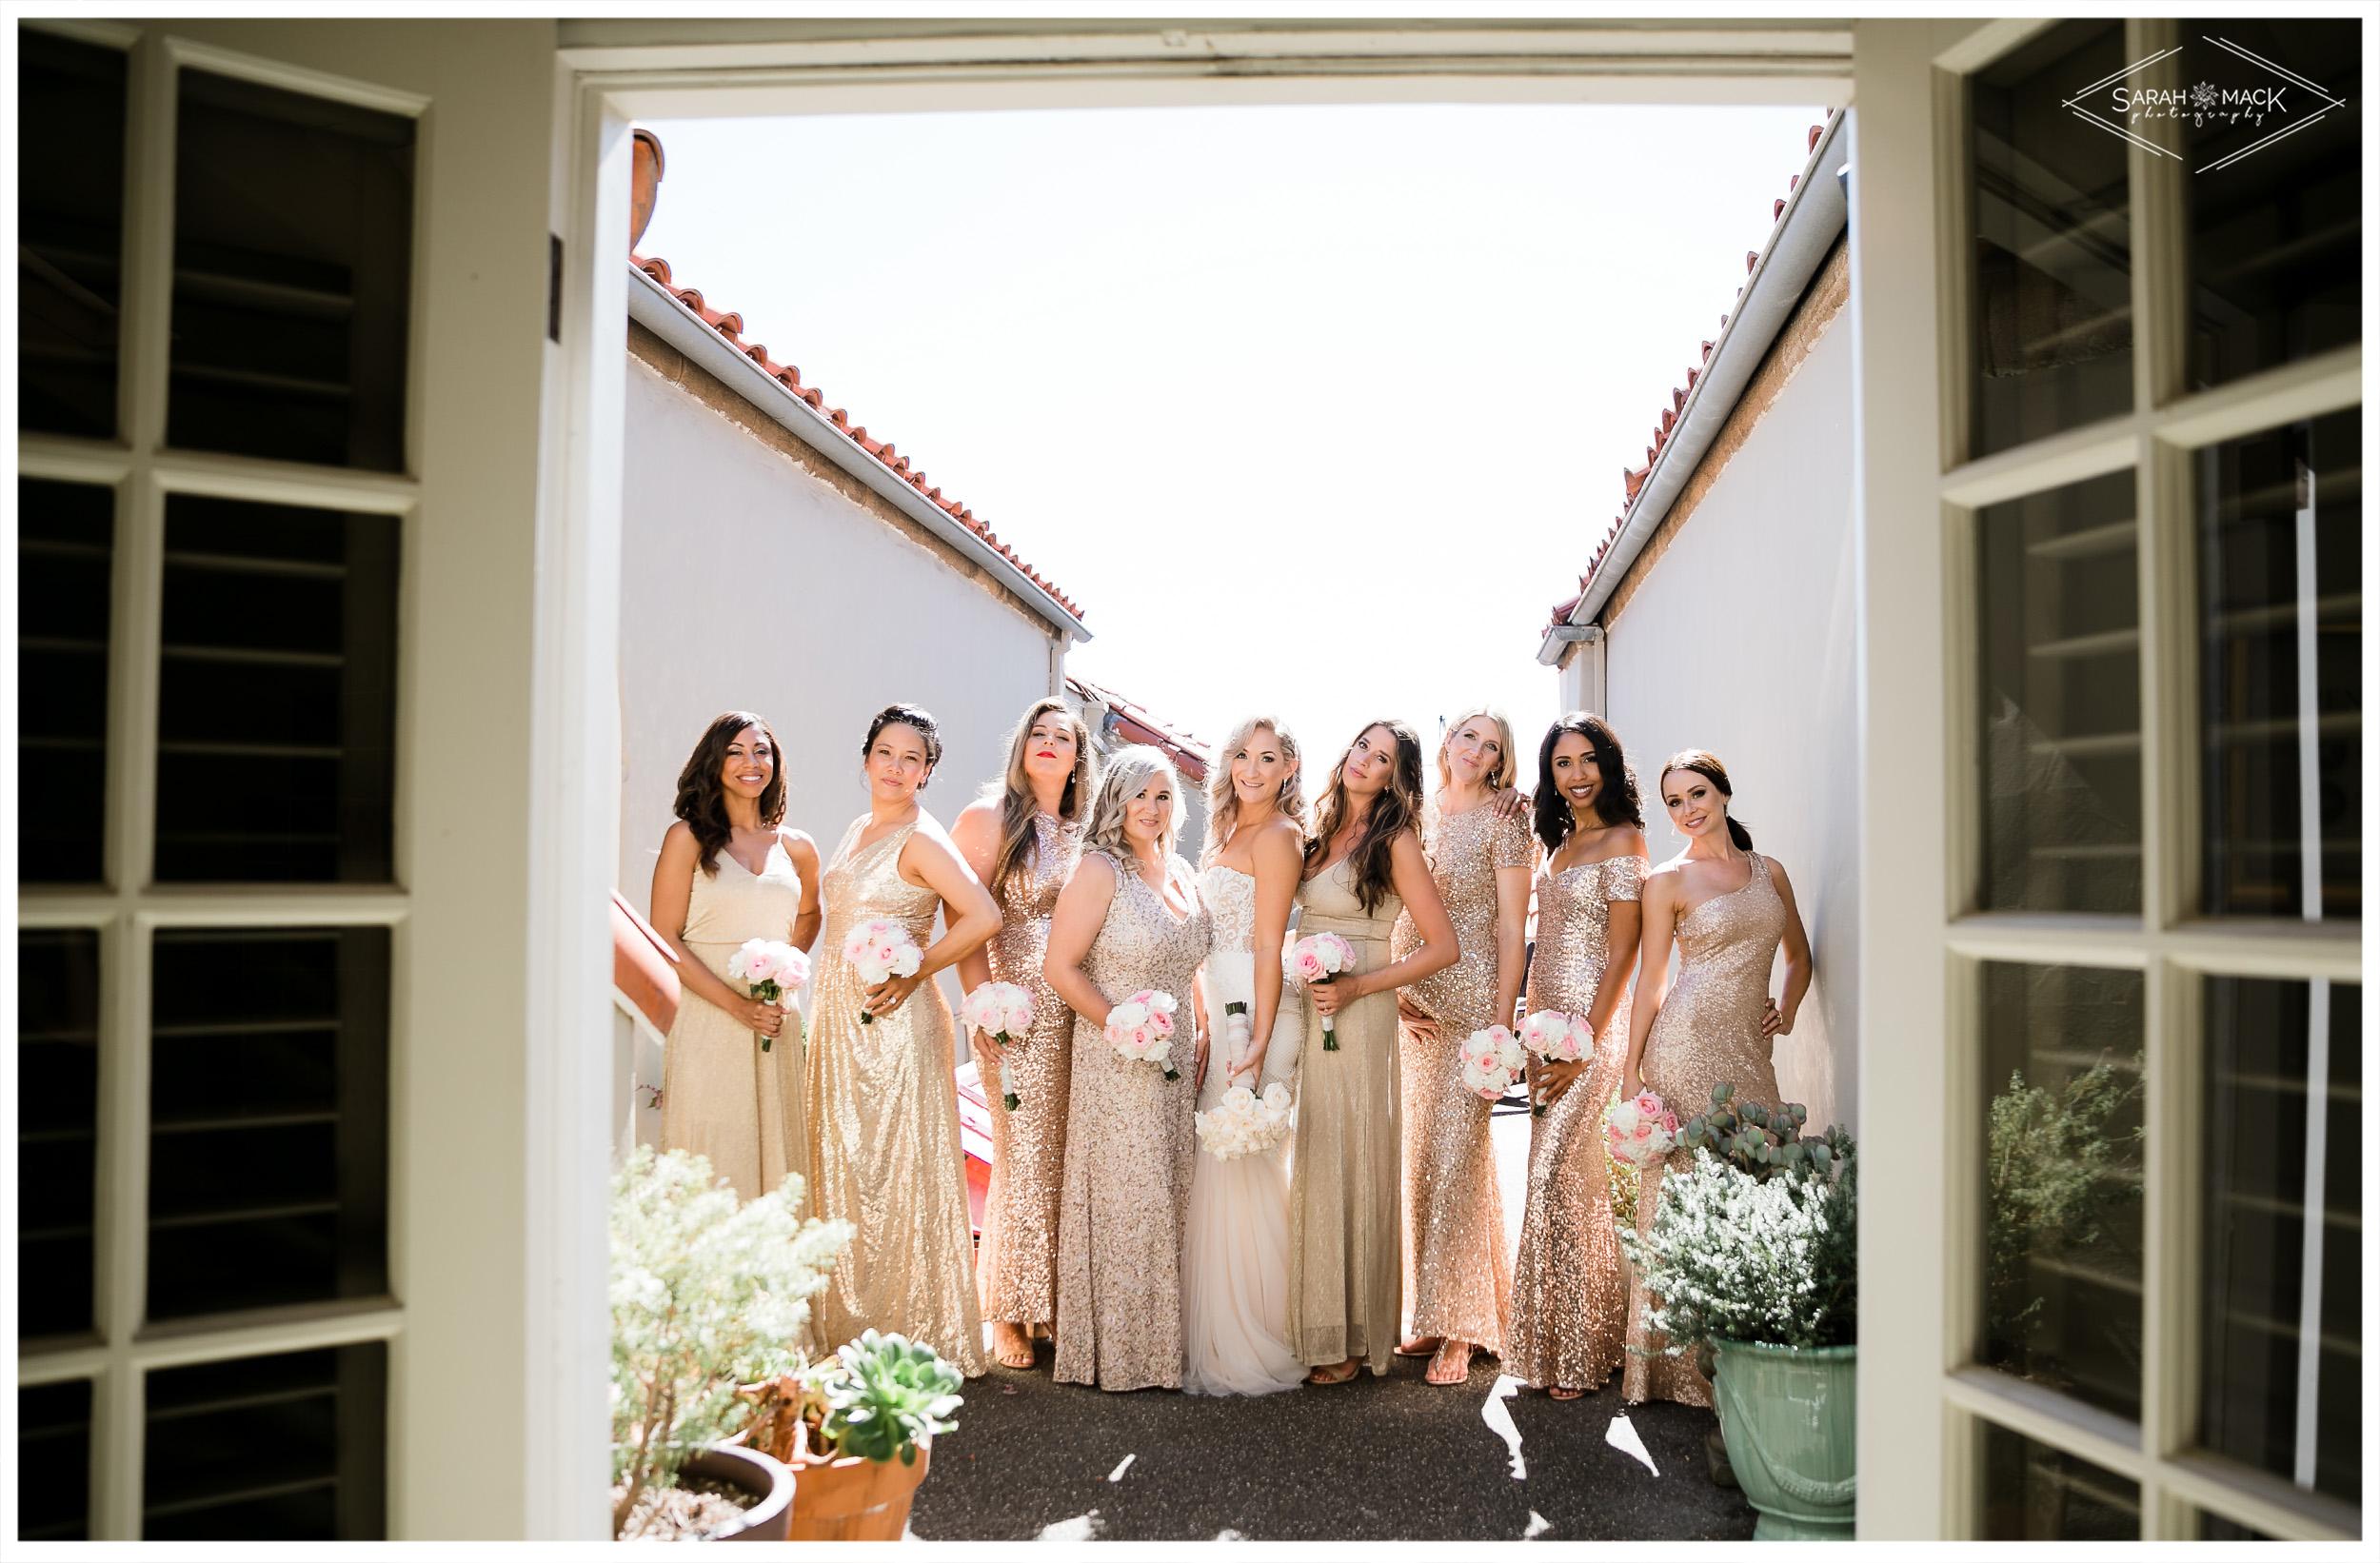 MK-Santa-Monica-Catholic-Church-Wedding-Photography-12.jpg